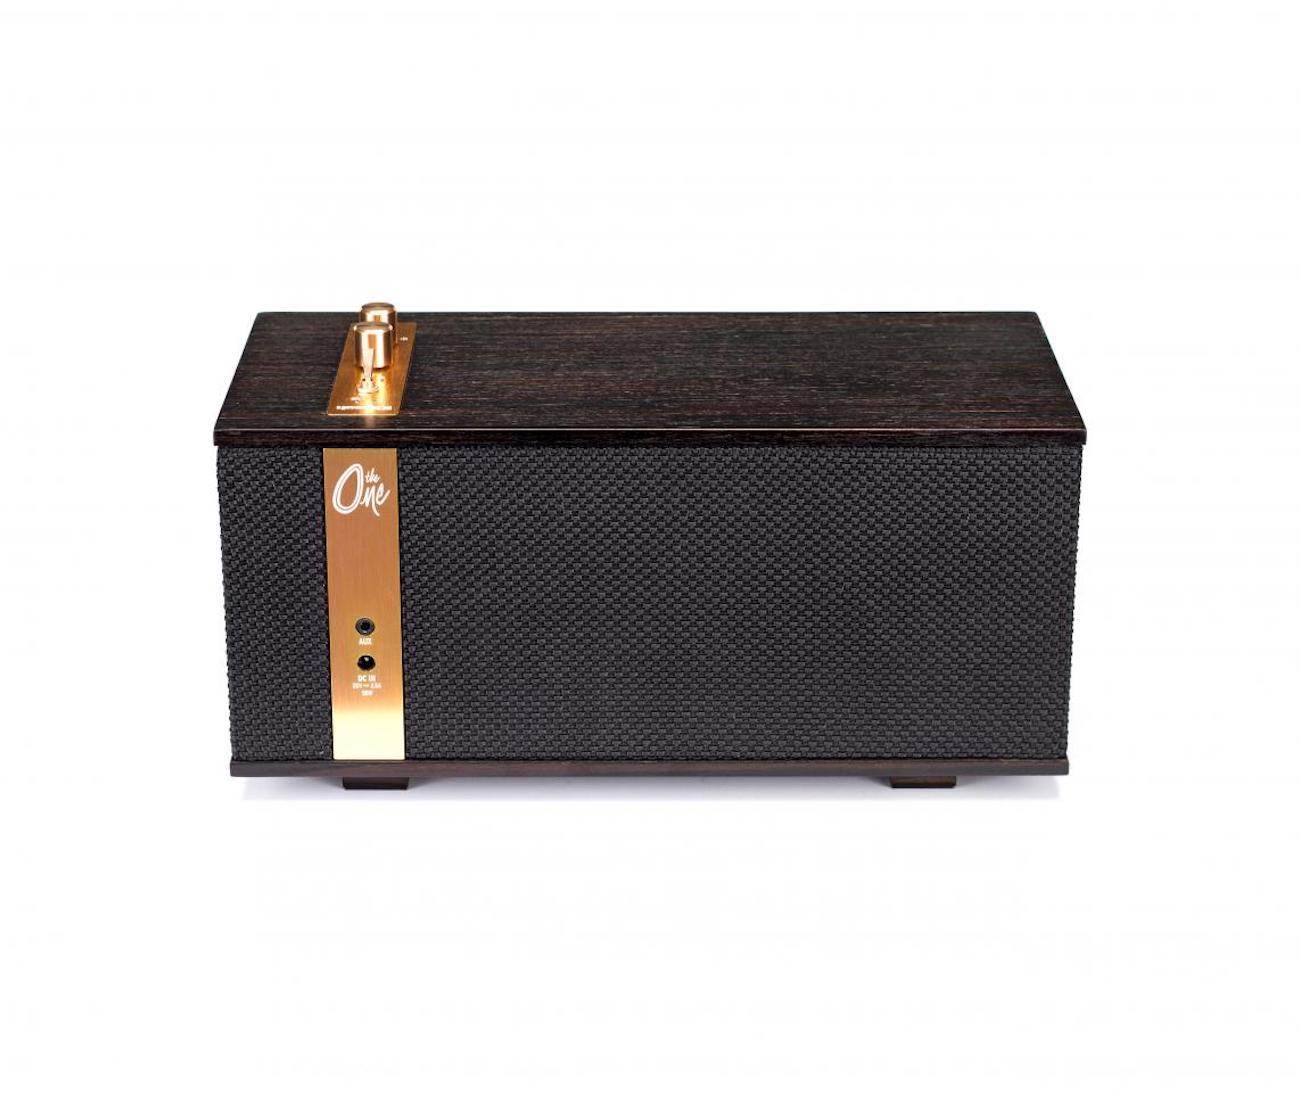 Klipsch Heritage Wireless Voice Control Speakers